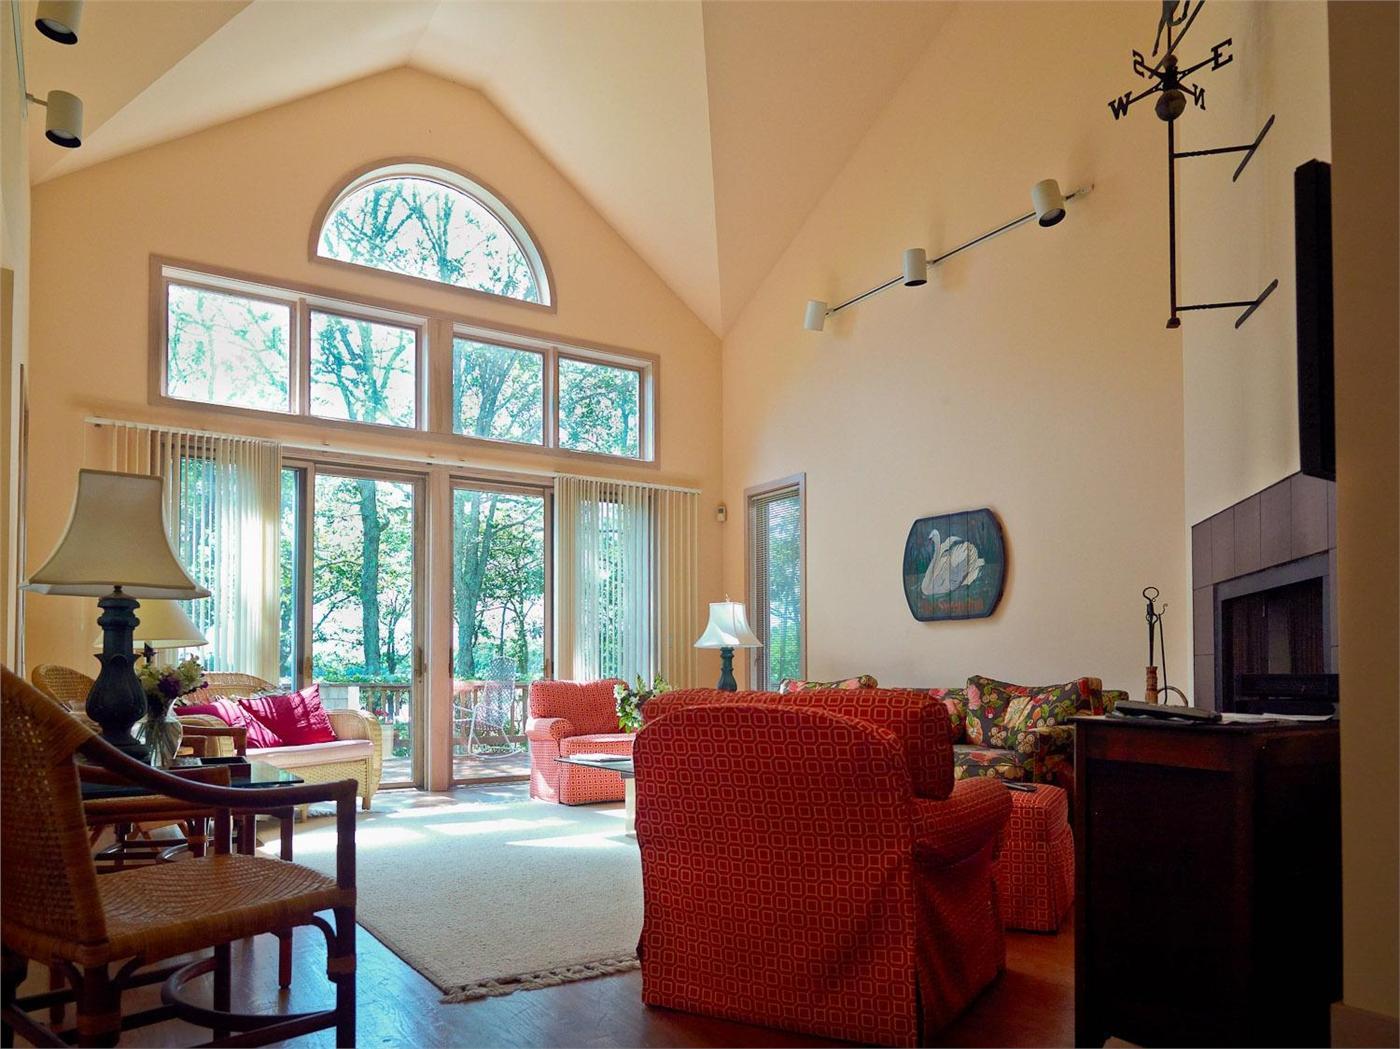 West tisbury vacation rental home in marthas vineyard ma02568 id 18138